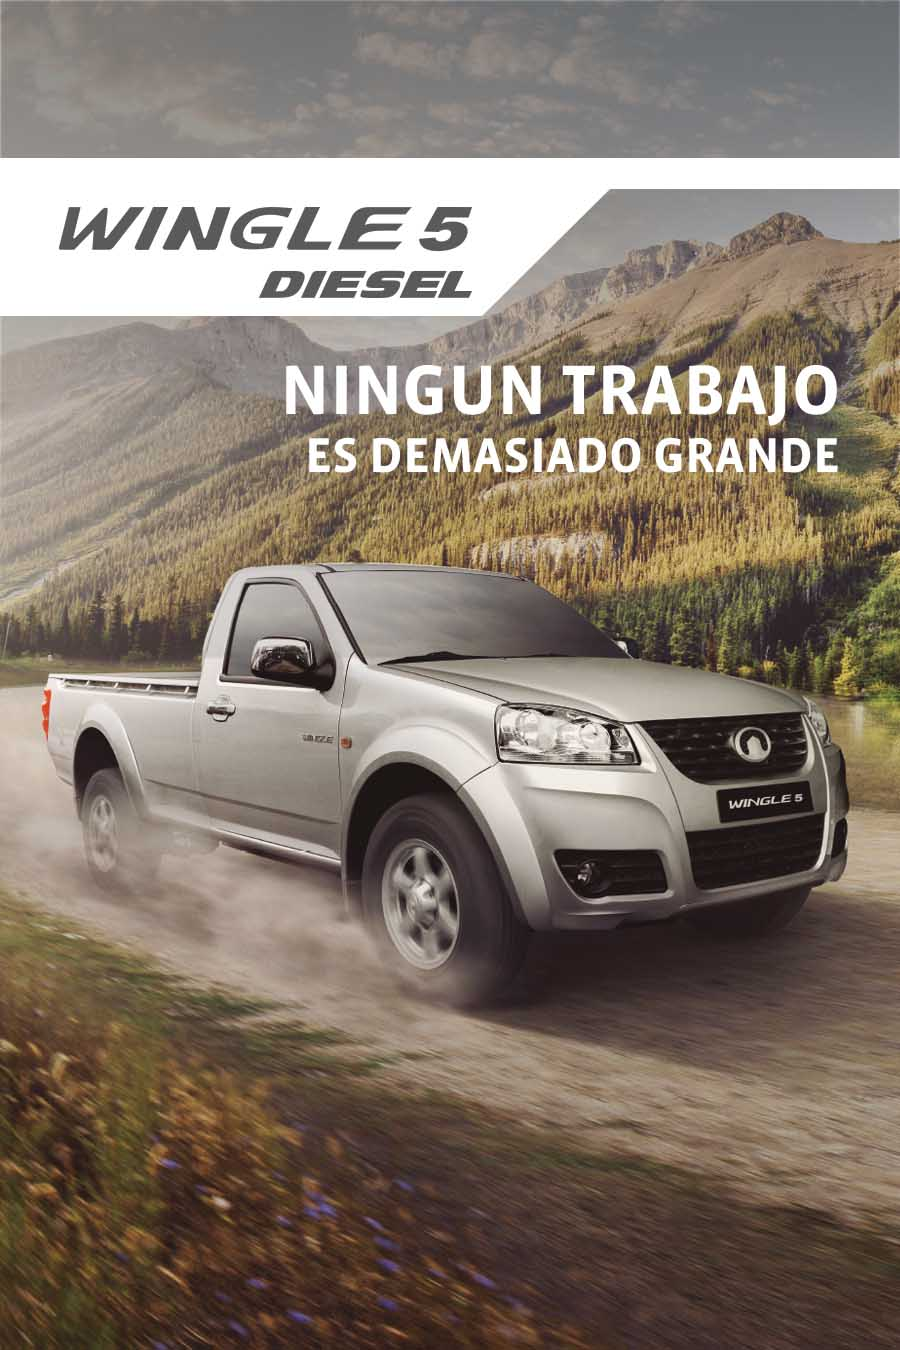 Wingle 5 Diesel Cabina Simple